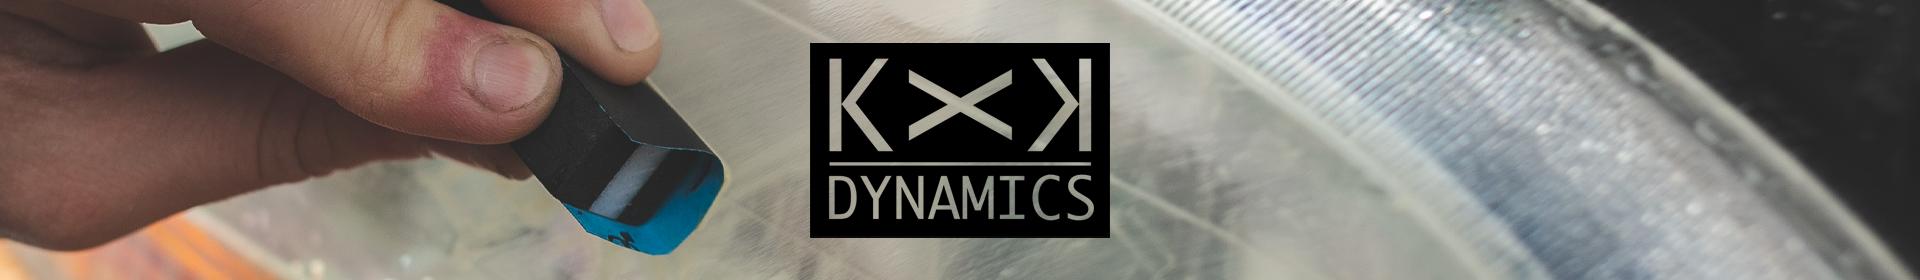 category-marketing-banner-brands-kxk-small.jpg